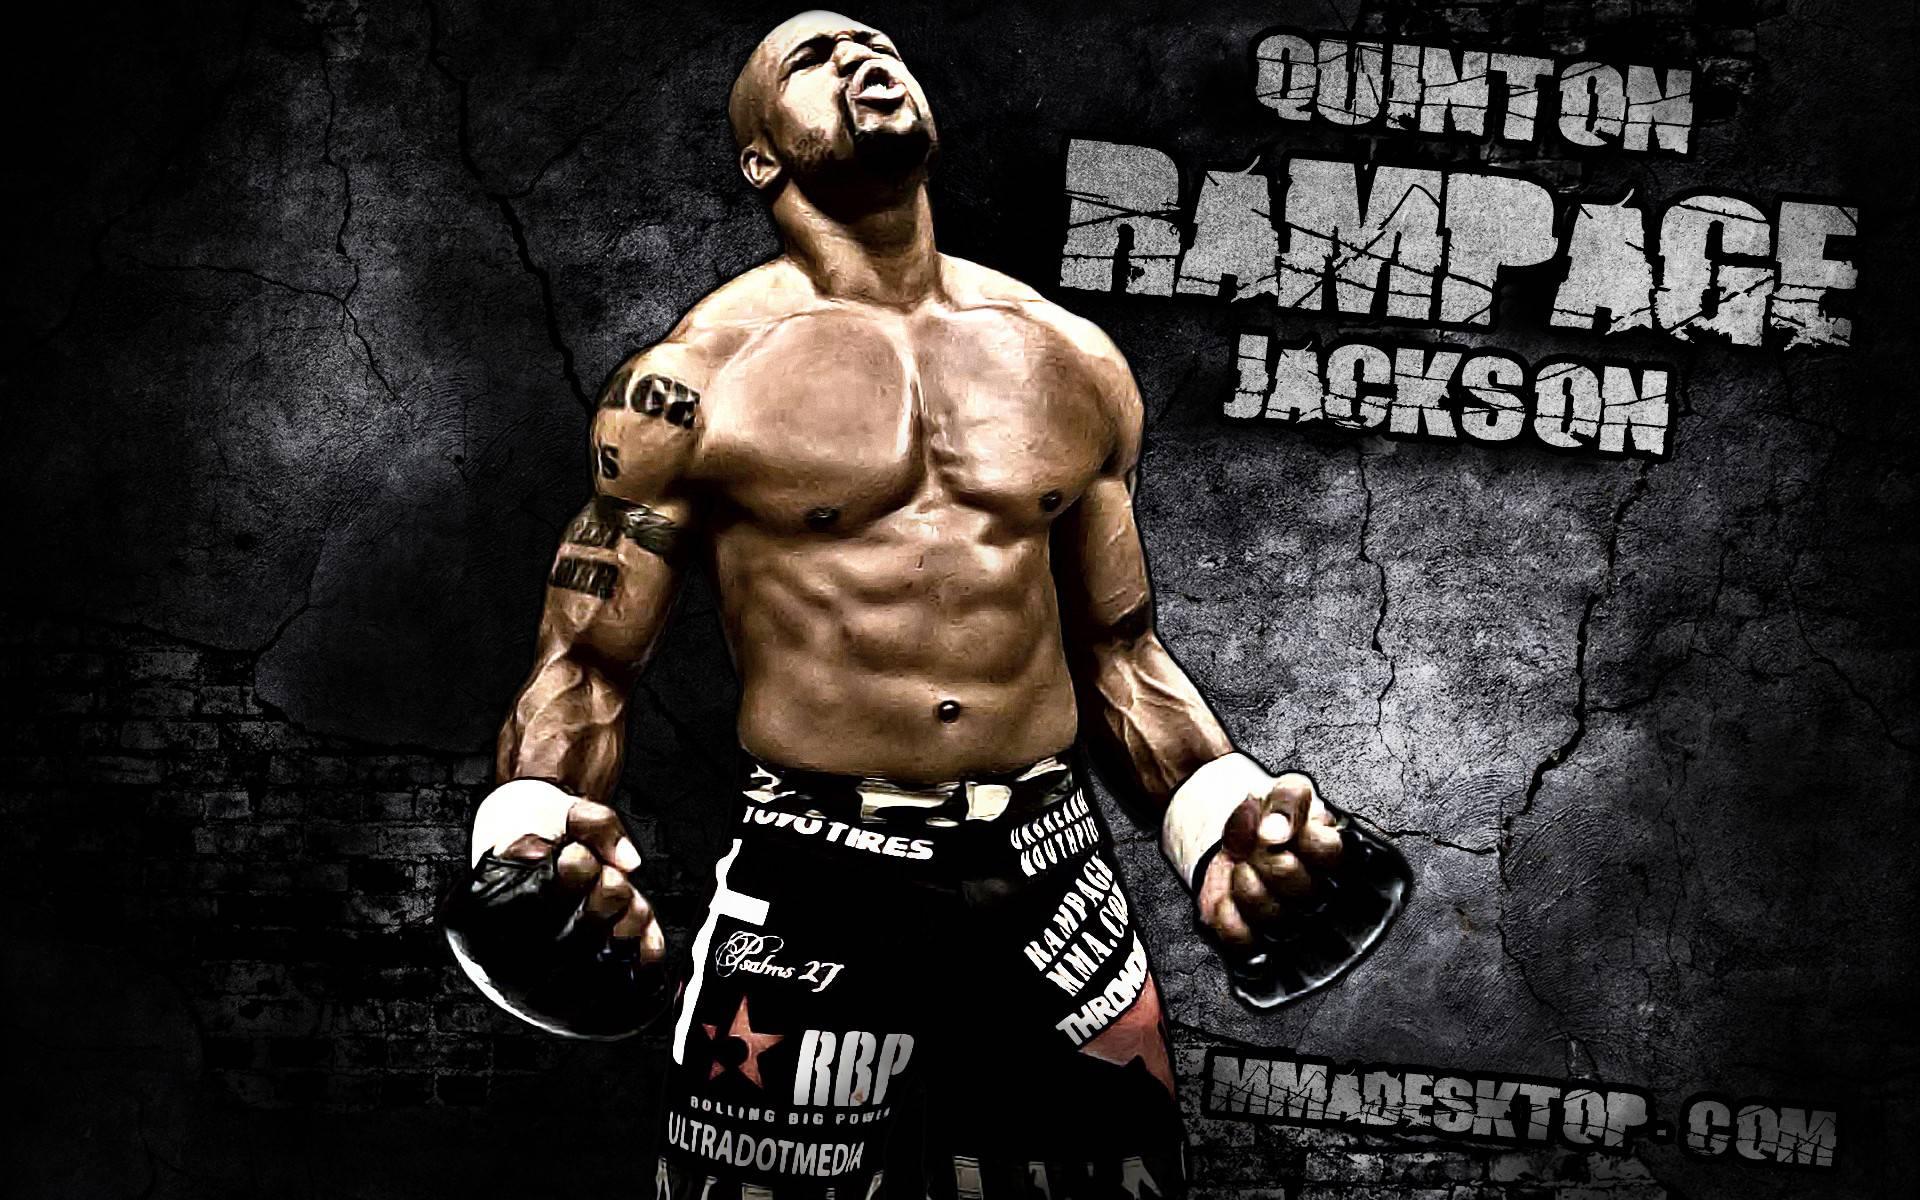 3973d8b7059c52308376e808828dbbd4 Jadwal Siaran UFC (Ultimate Fighting Championship) Di RCTI